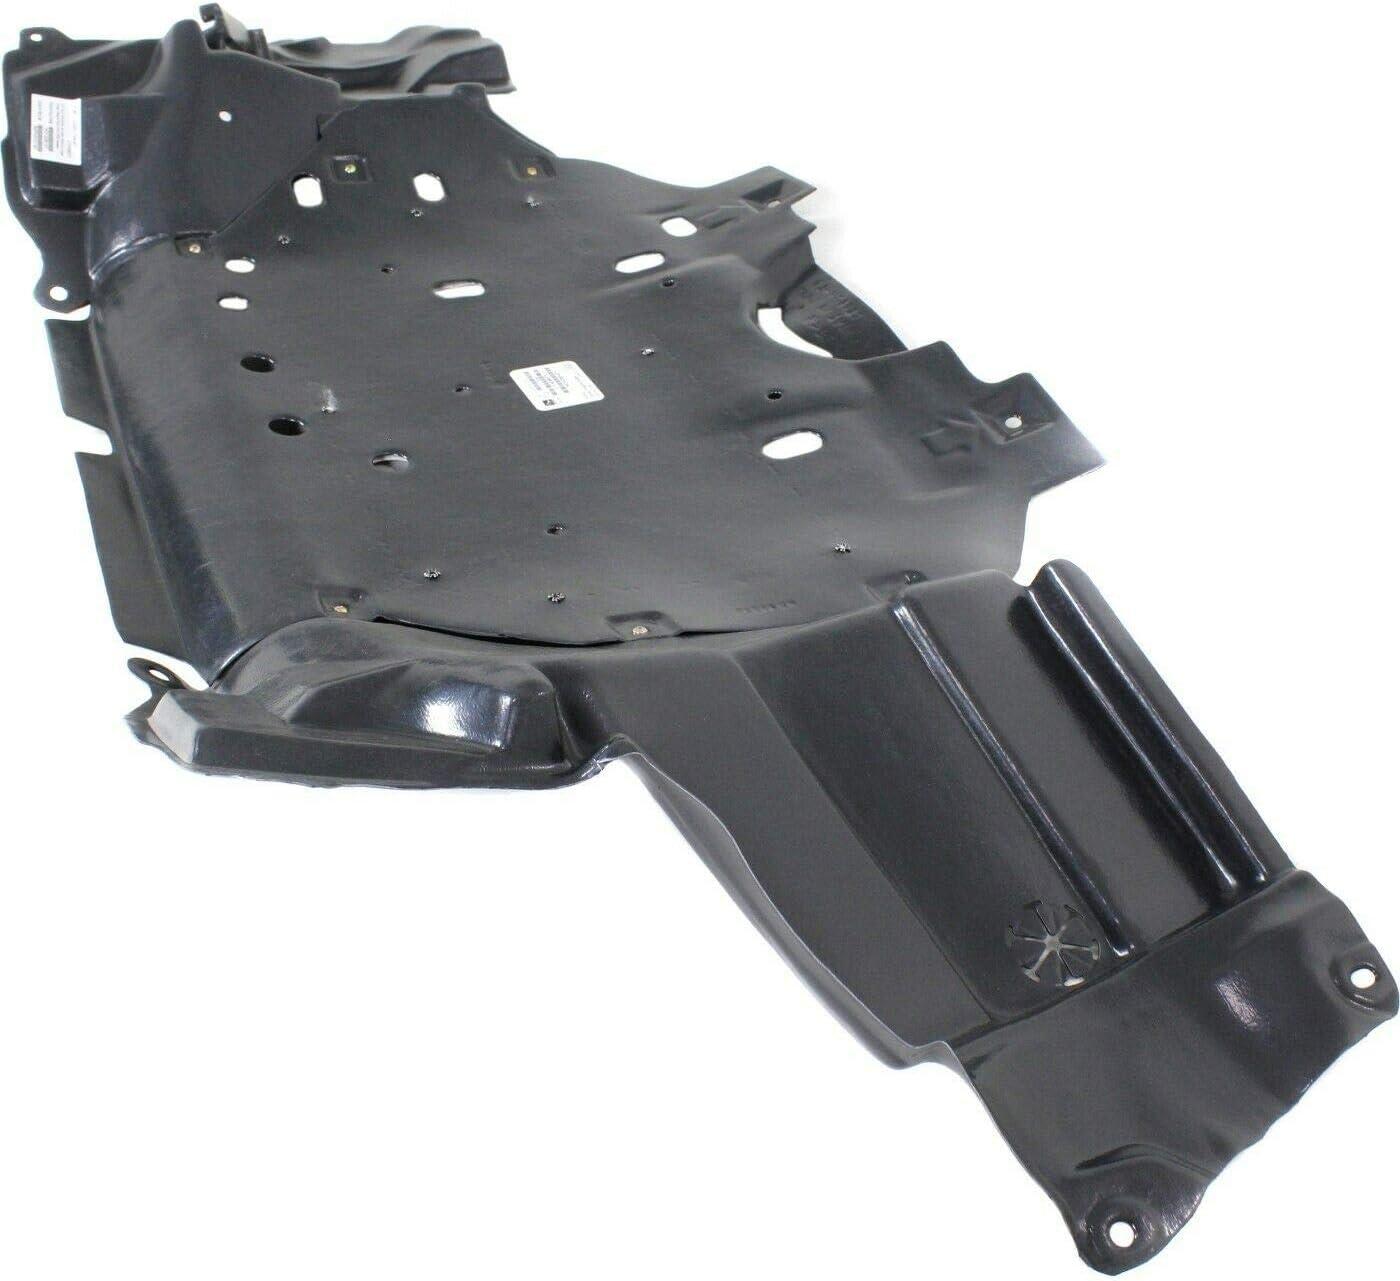 HO1228148 74110T5RA10 Dx//Lx//Se Models Mexico Built Robautoparts Engine Splash Shield Front 2015-2020 for Honda Fit Under Cover Ex//Ex-L//